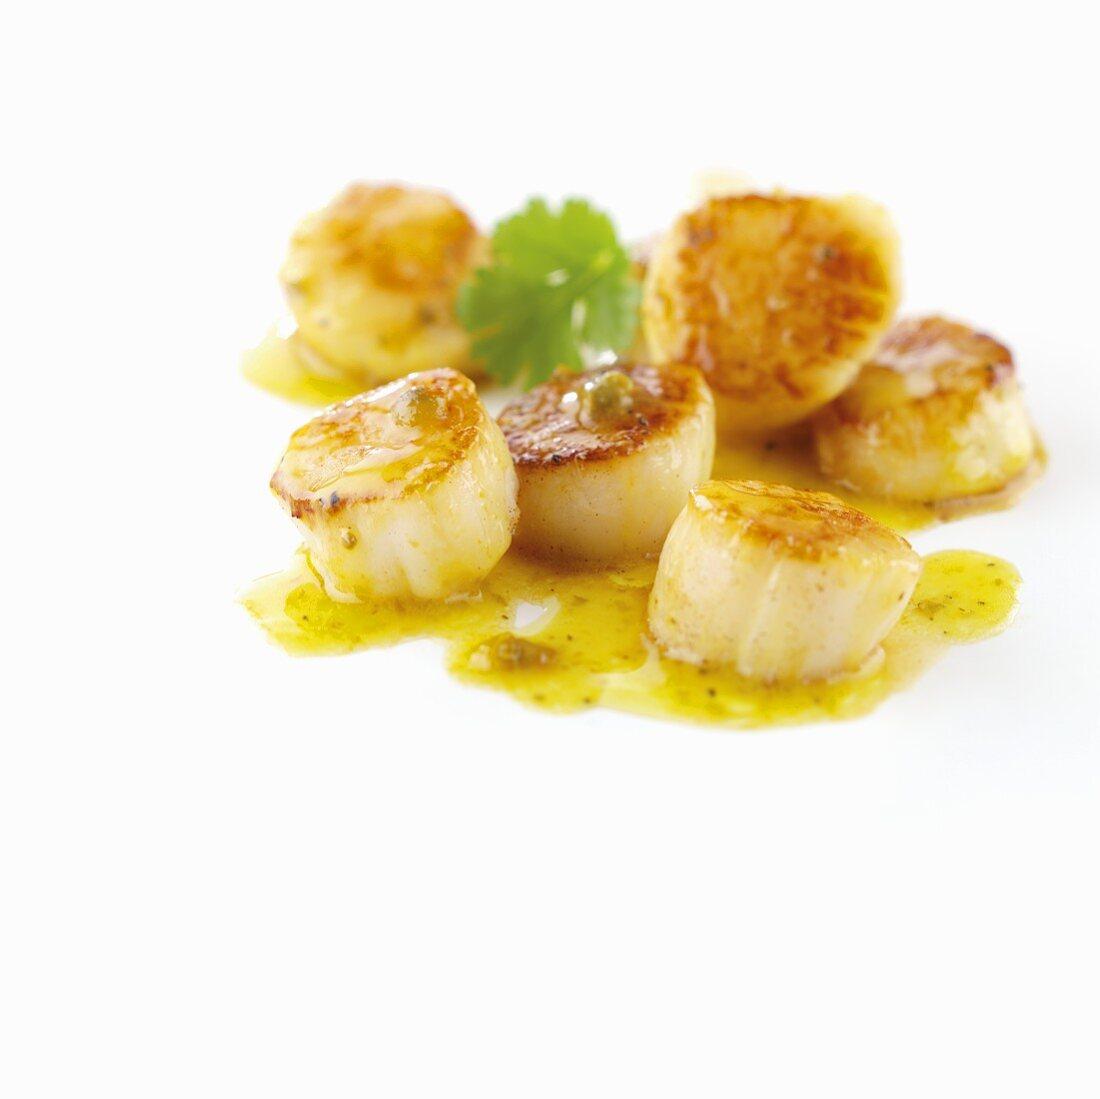 Fried scallops on saffron sauce